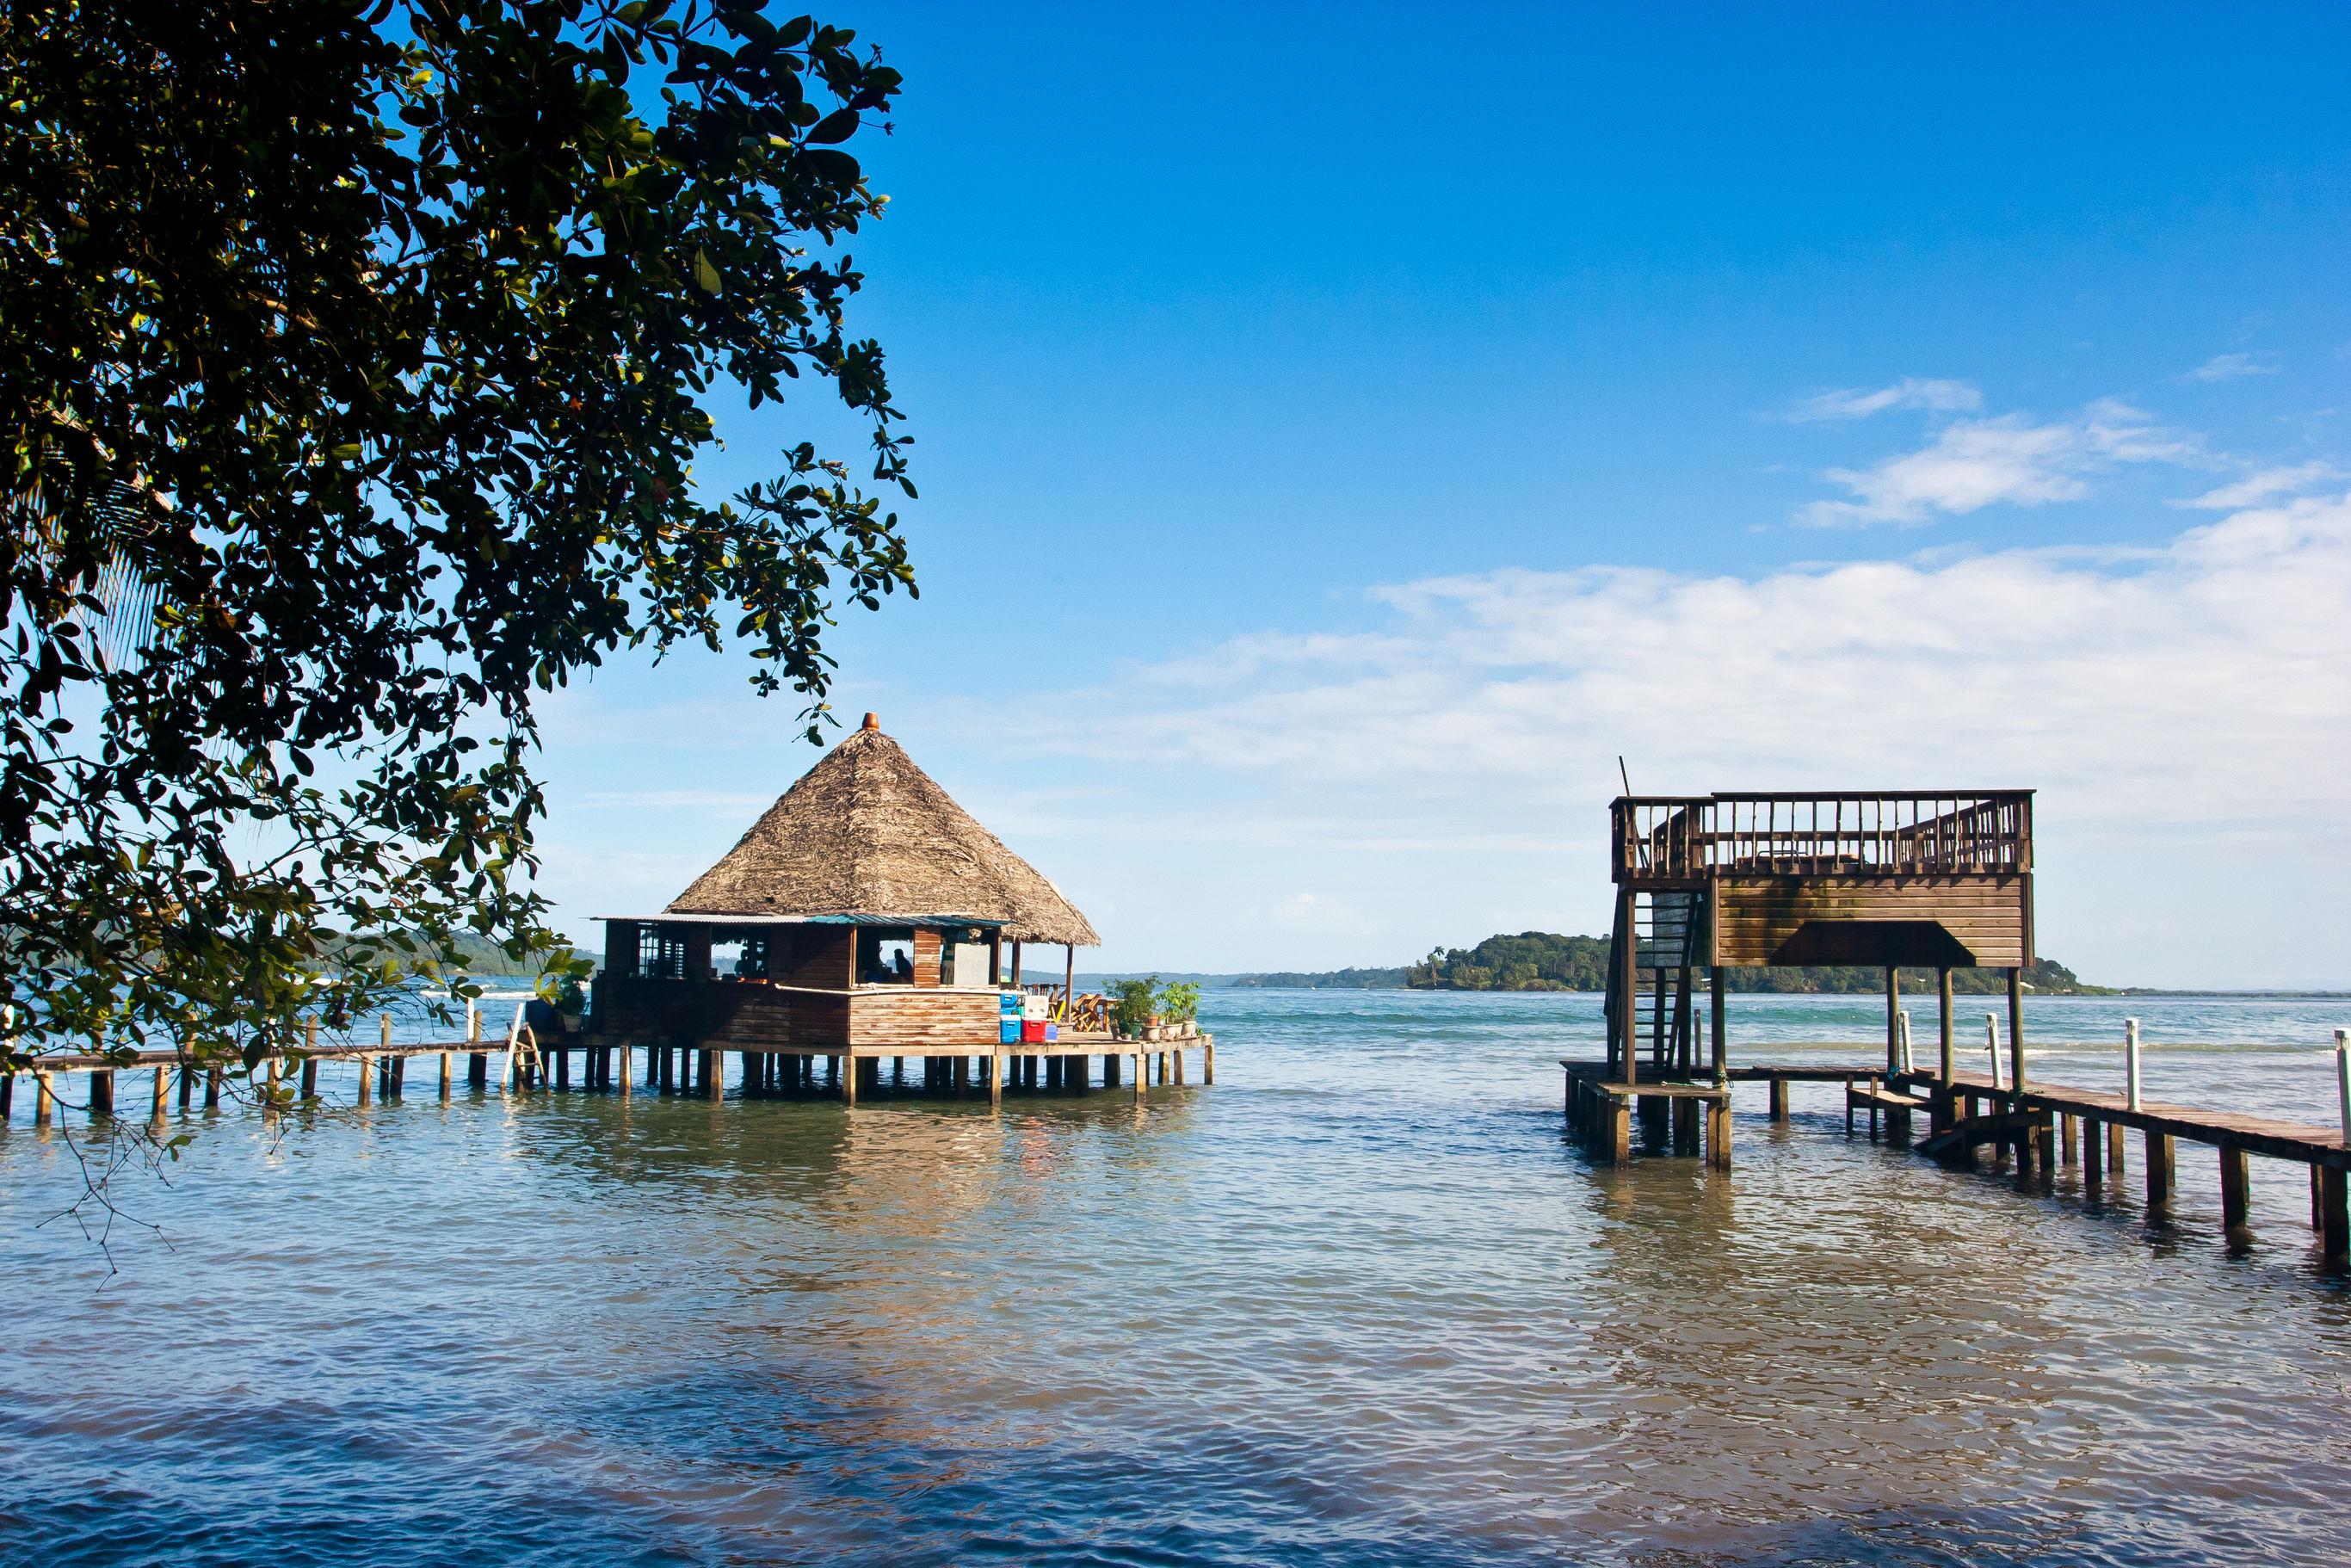 Sfeerimpressie Rondreis Panama: Hoogtepunten van Panama